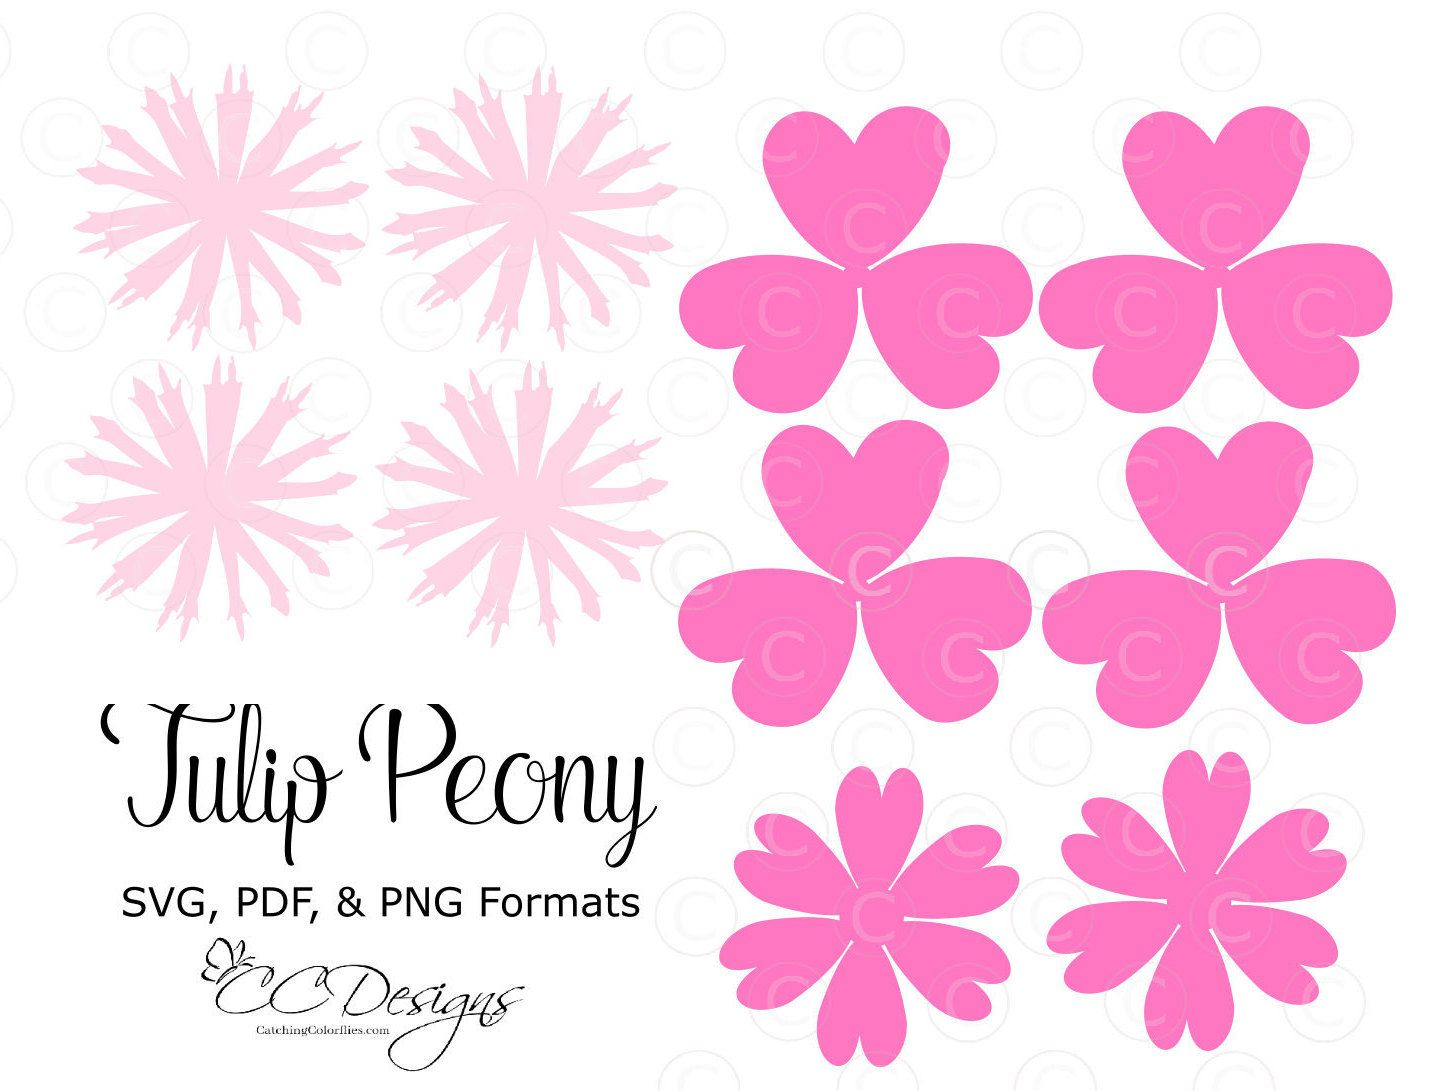 Tulip peony paper flower templates diy paper flower kit svg cut tulip peony paper flower templates diy paper flower kit svg cut files printable pdf templates mightylinksfo